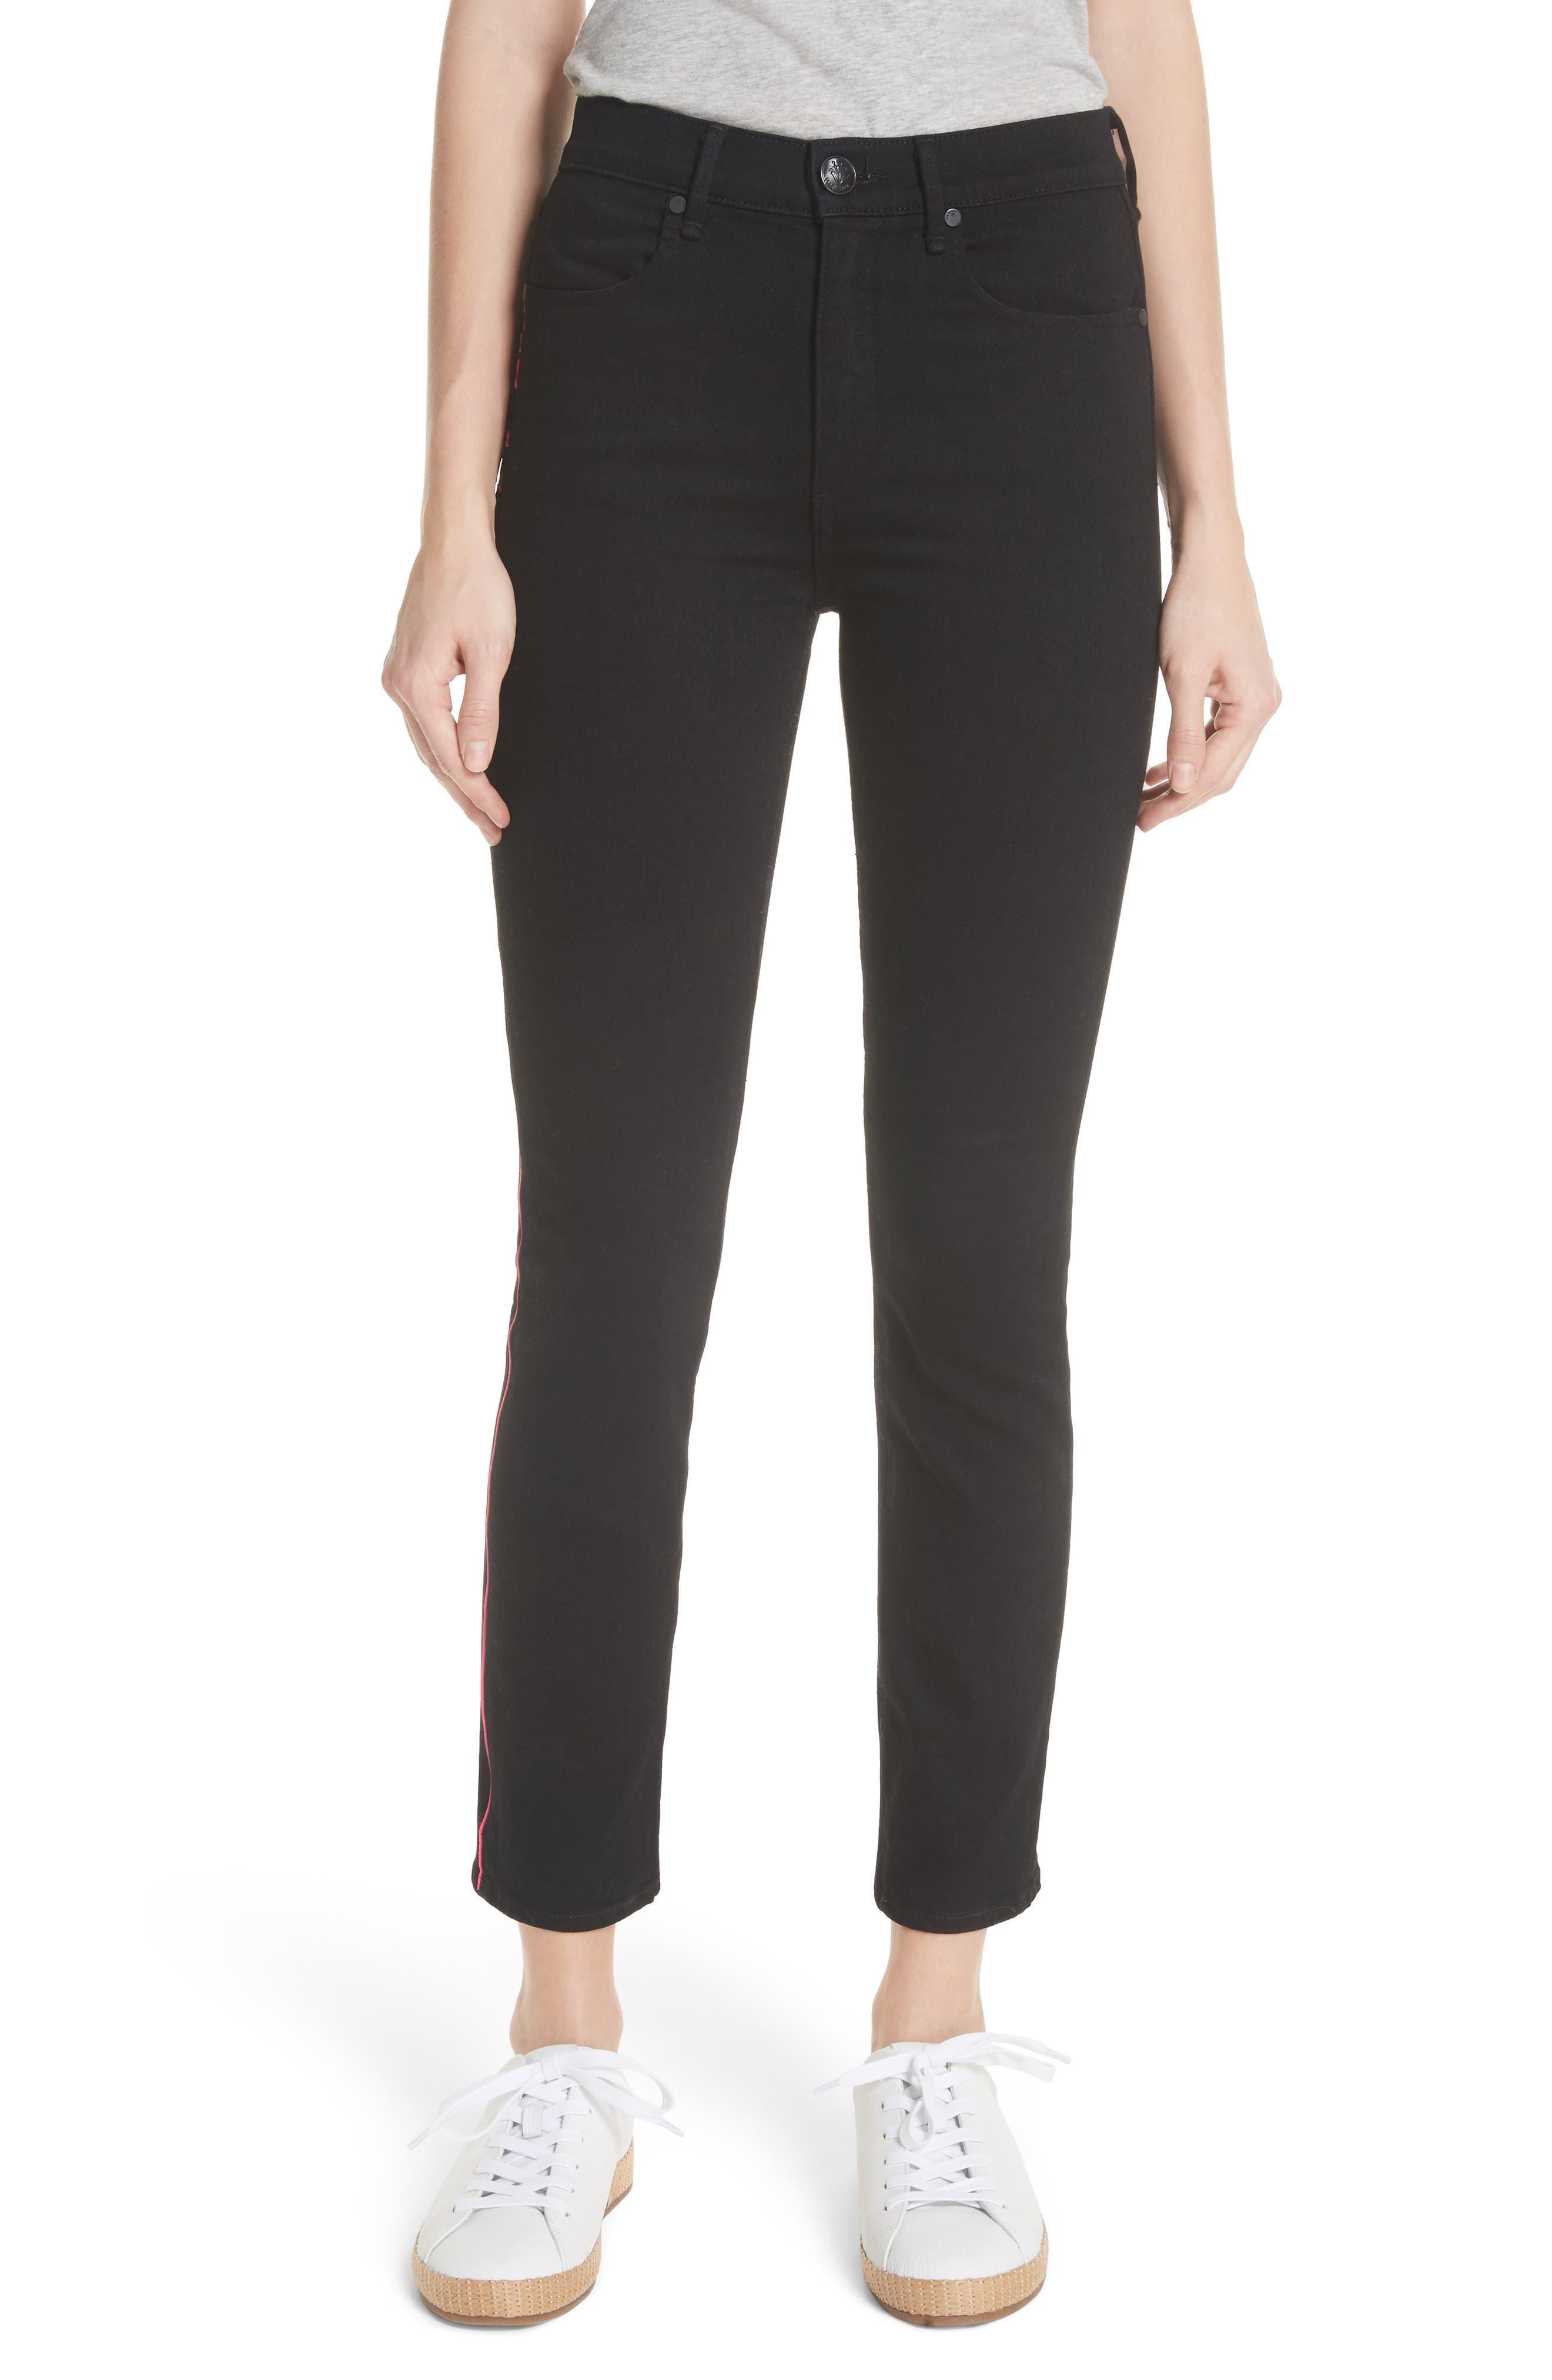 Alternate Image 1 Selected - rag & bone/JEAN Ash High Waist Skinny Jeans (Stone Kuro)